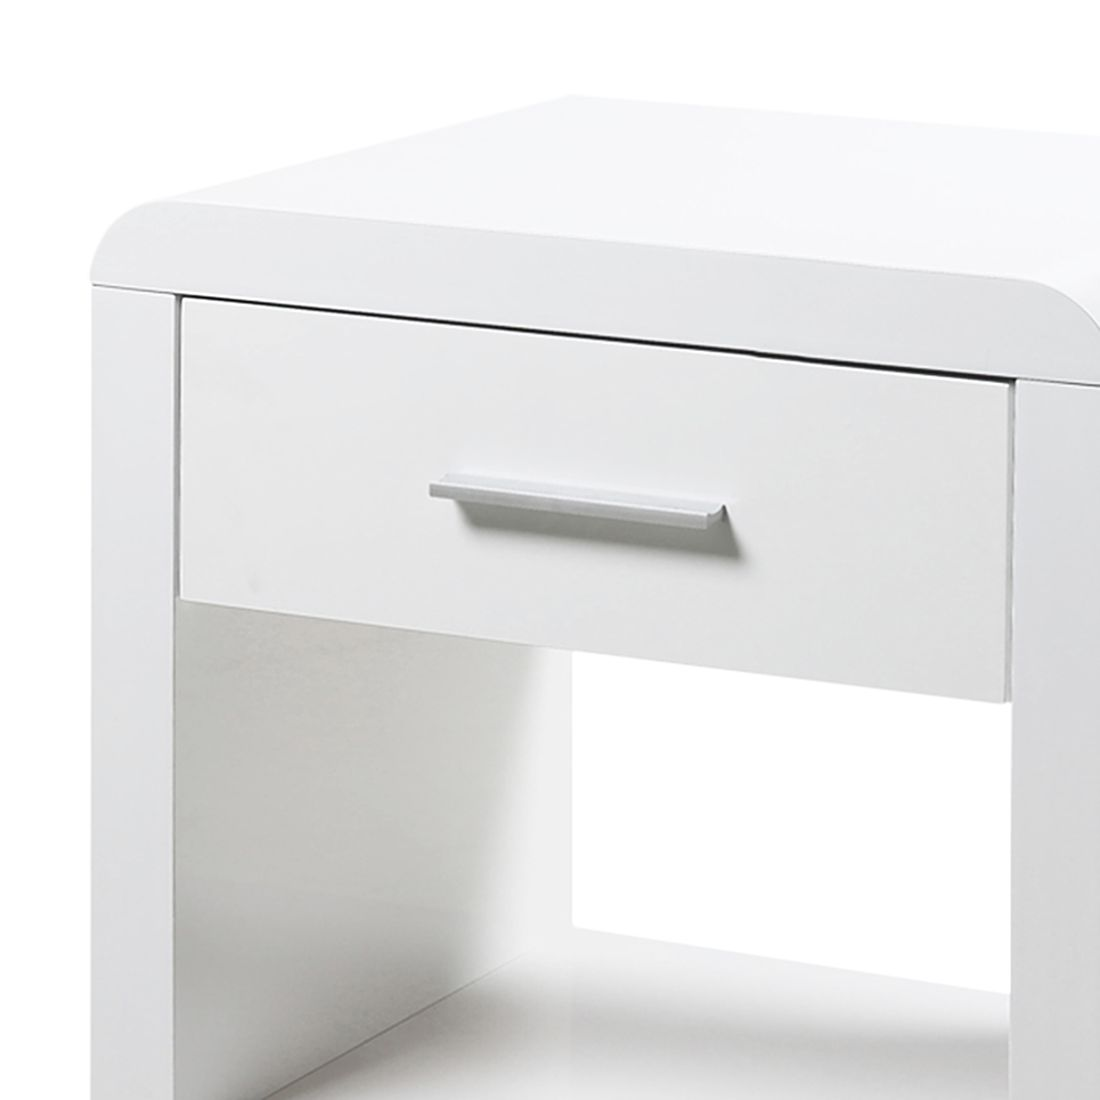 Nachtkonsole Easy – Weiß, roomscape – MAC000505 – Möbel8